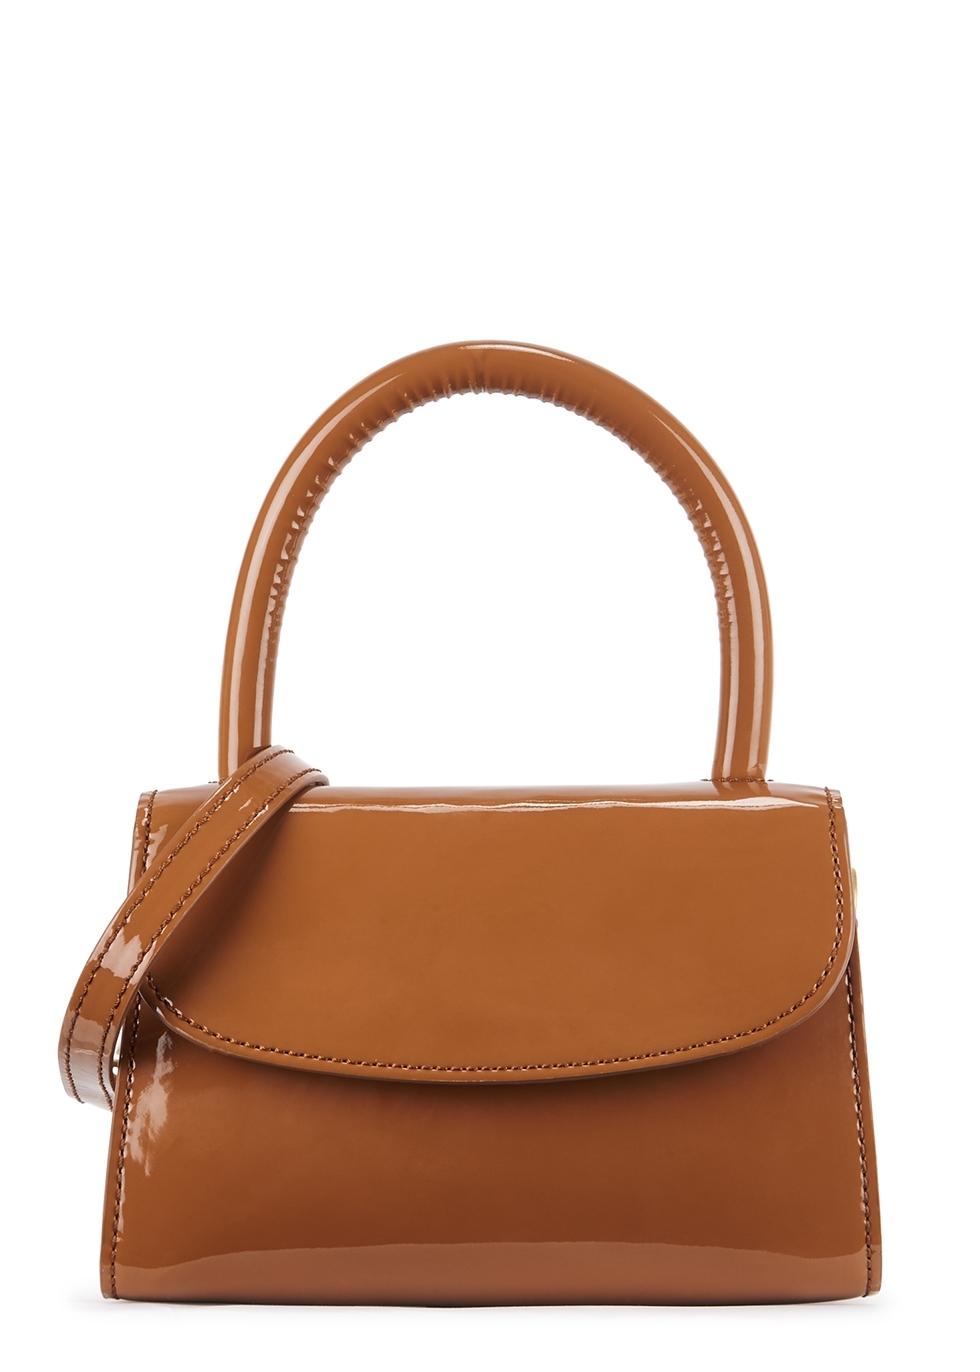 7f4cfde96ab9c Women s Designer Bags